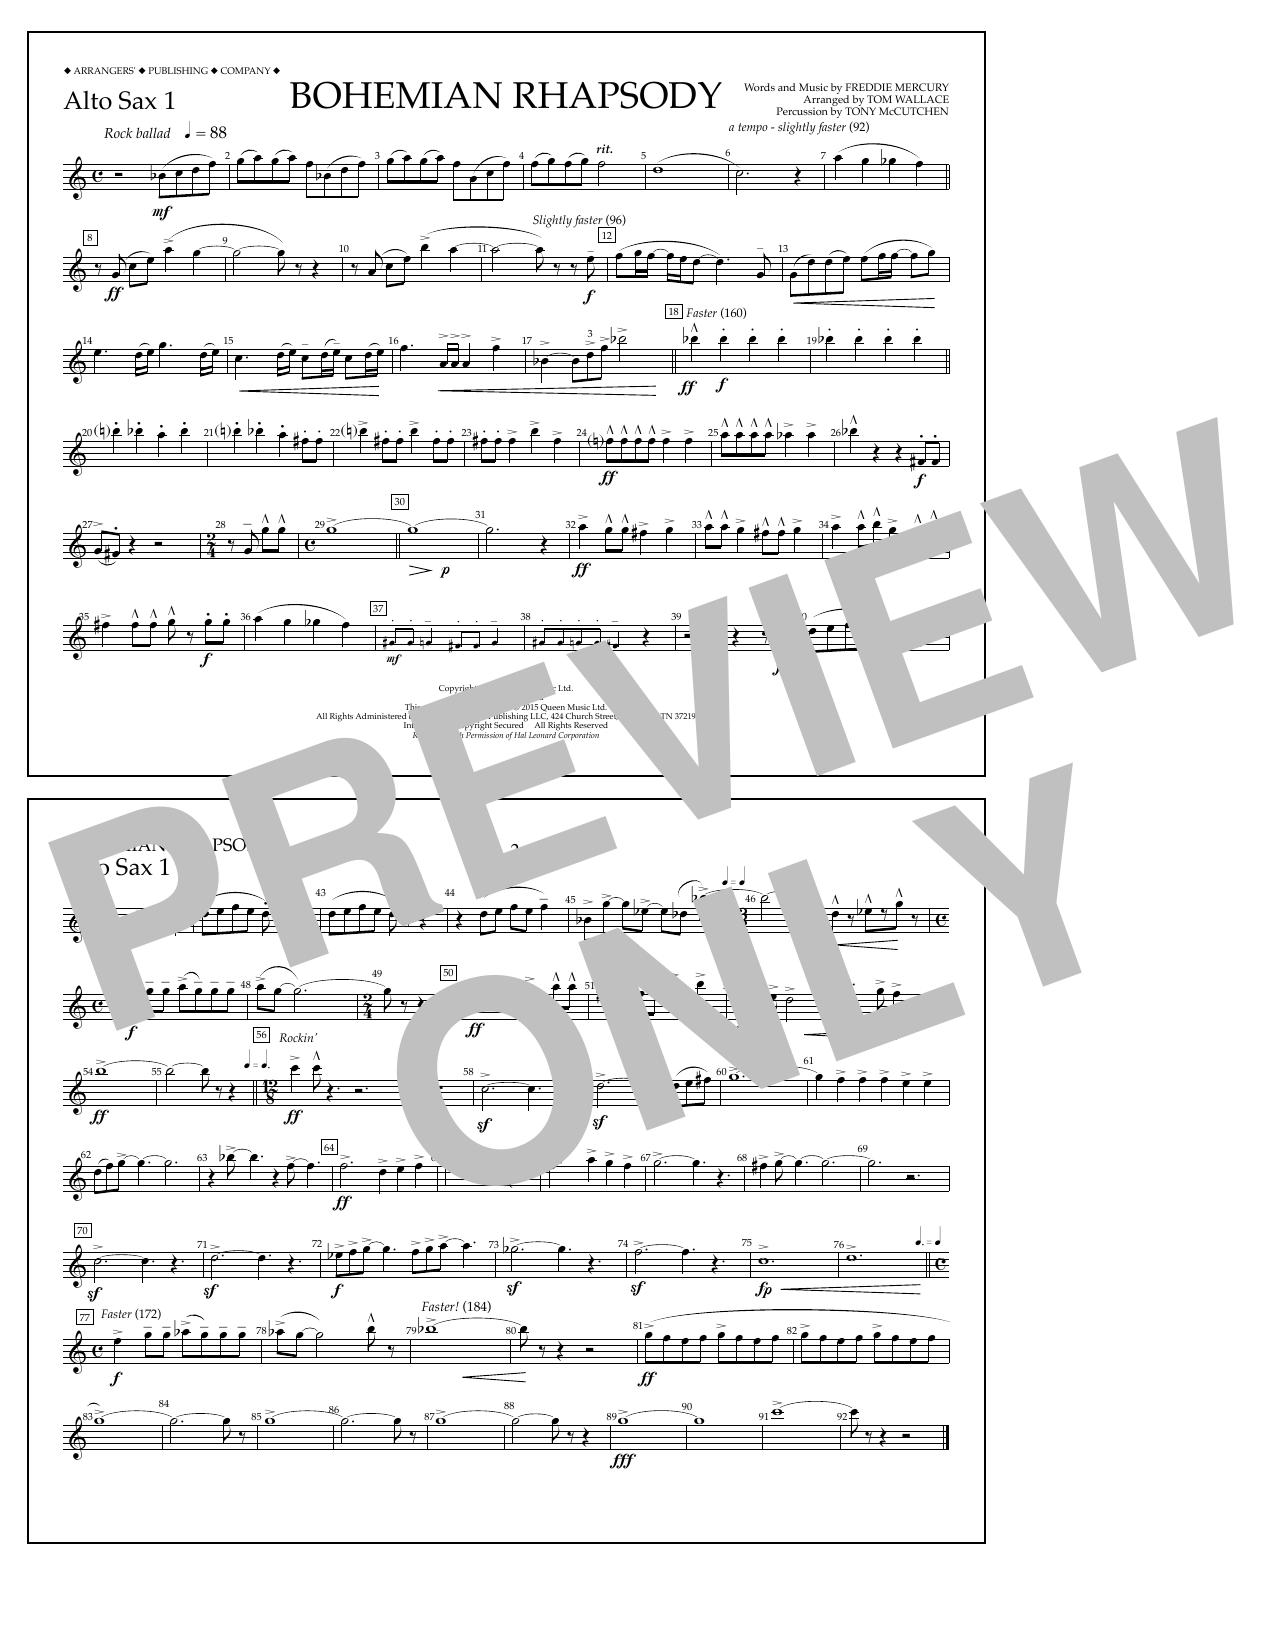 Bohemian Rhapsody - Alto Sax 1 (Marching Band)